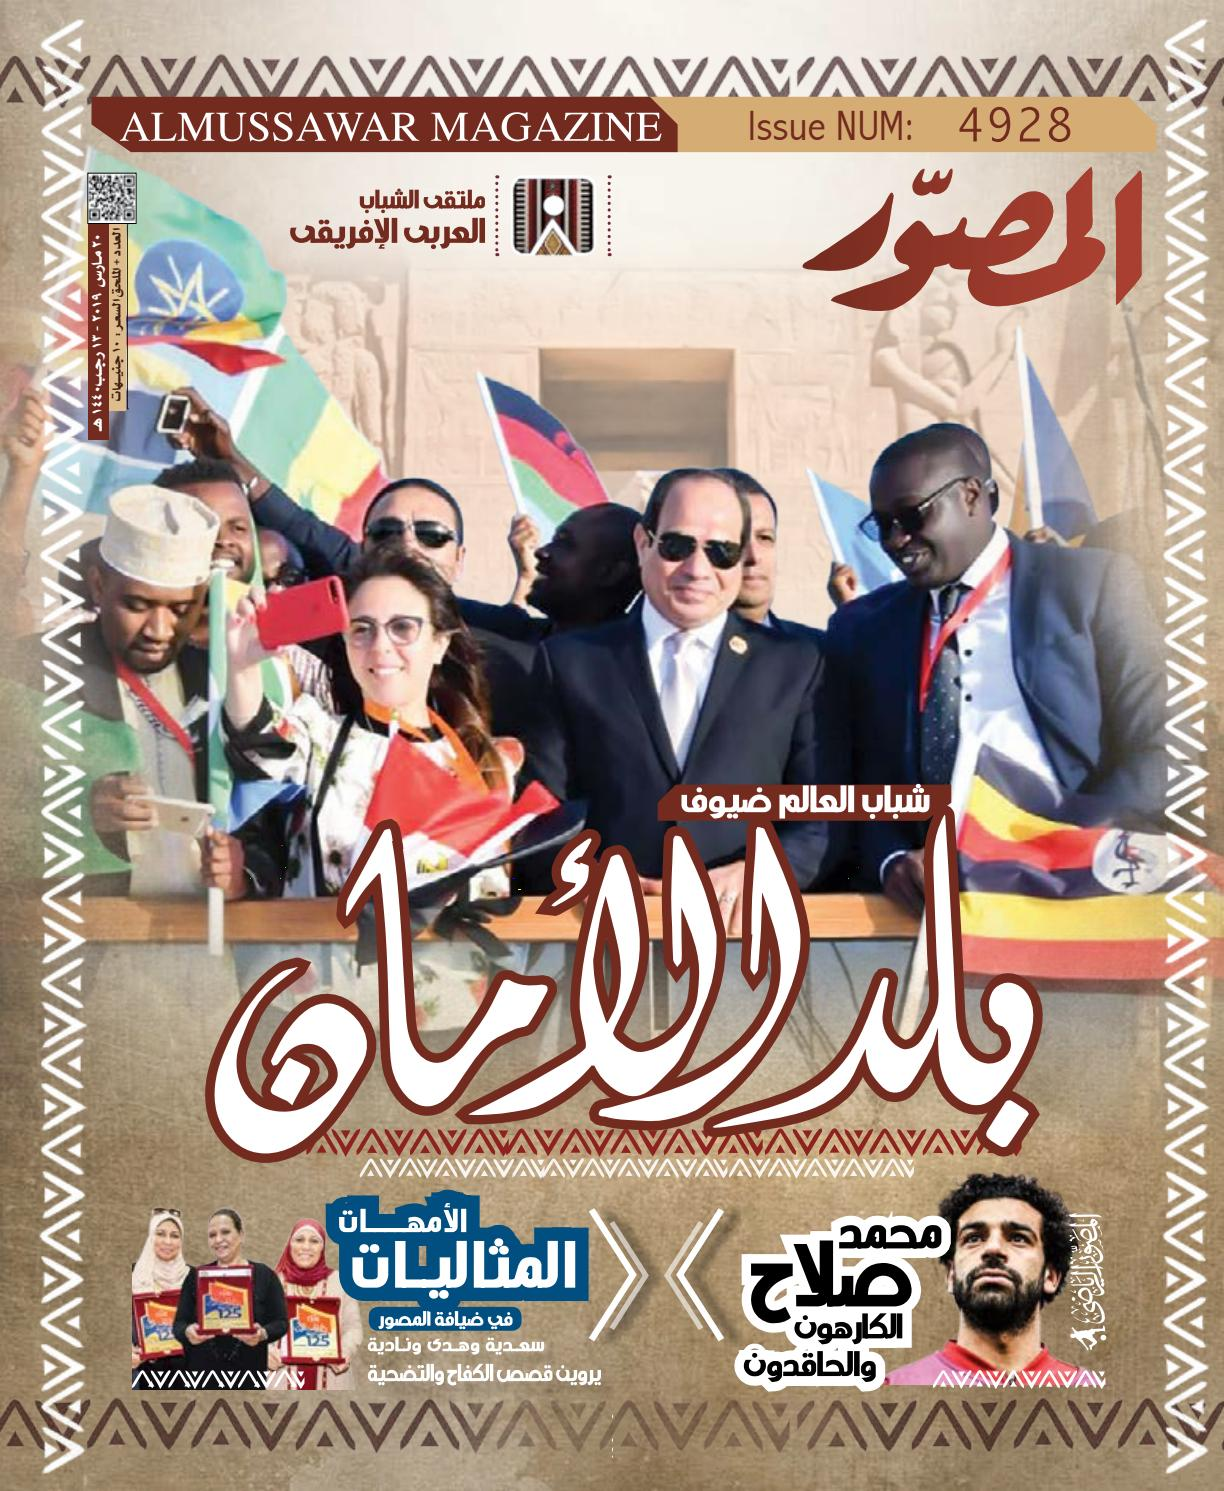 a32c71e11 مجلة المصور by اليوم السابع - issuu